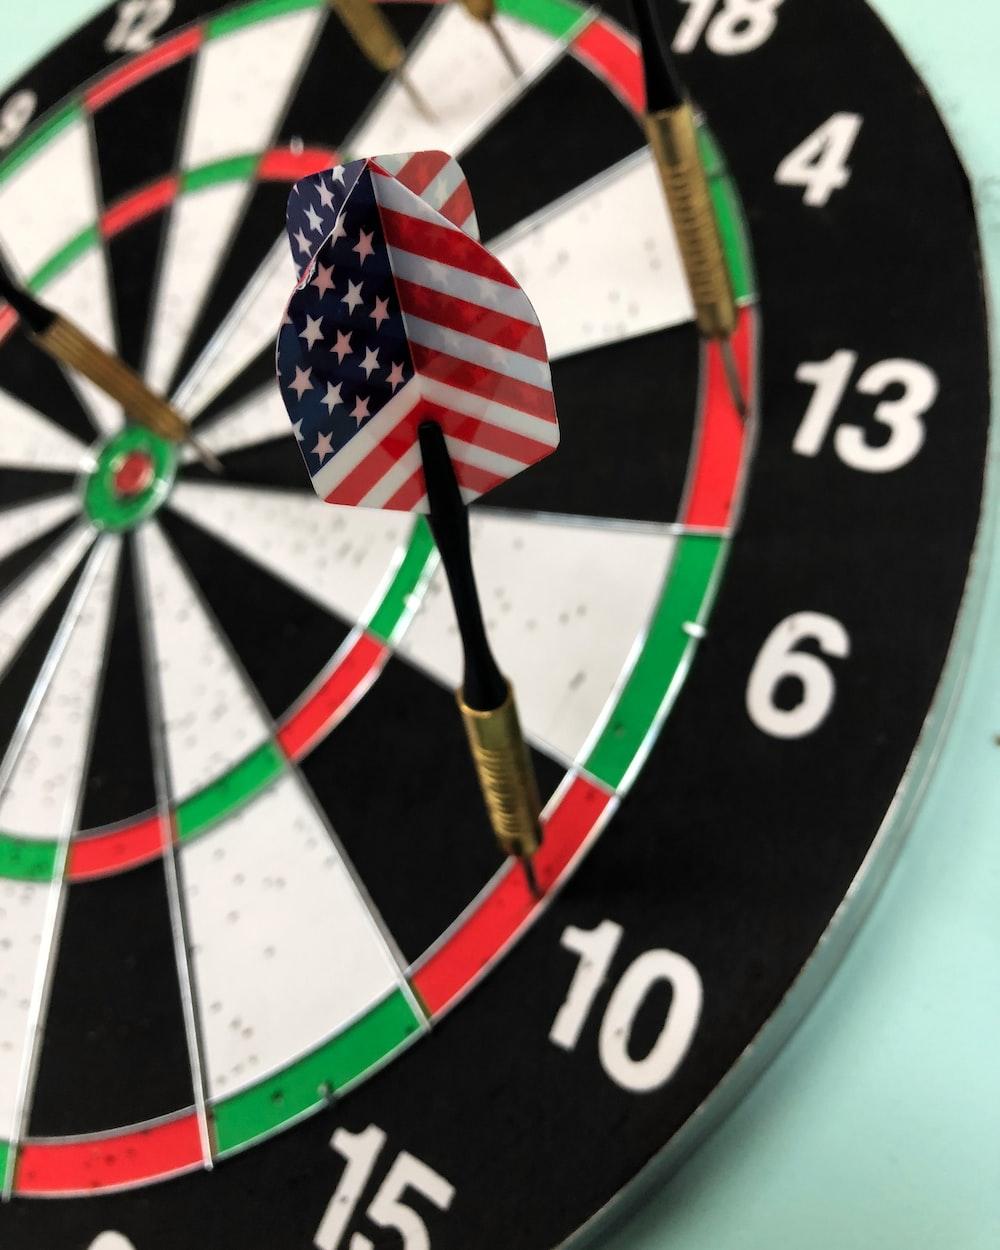 dart on dartboard